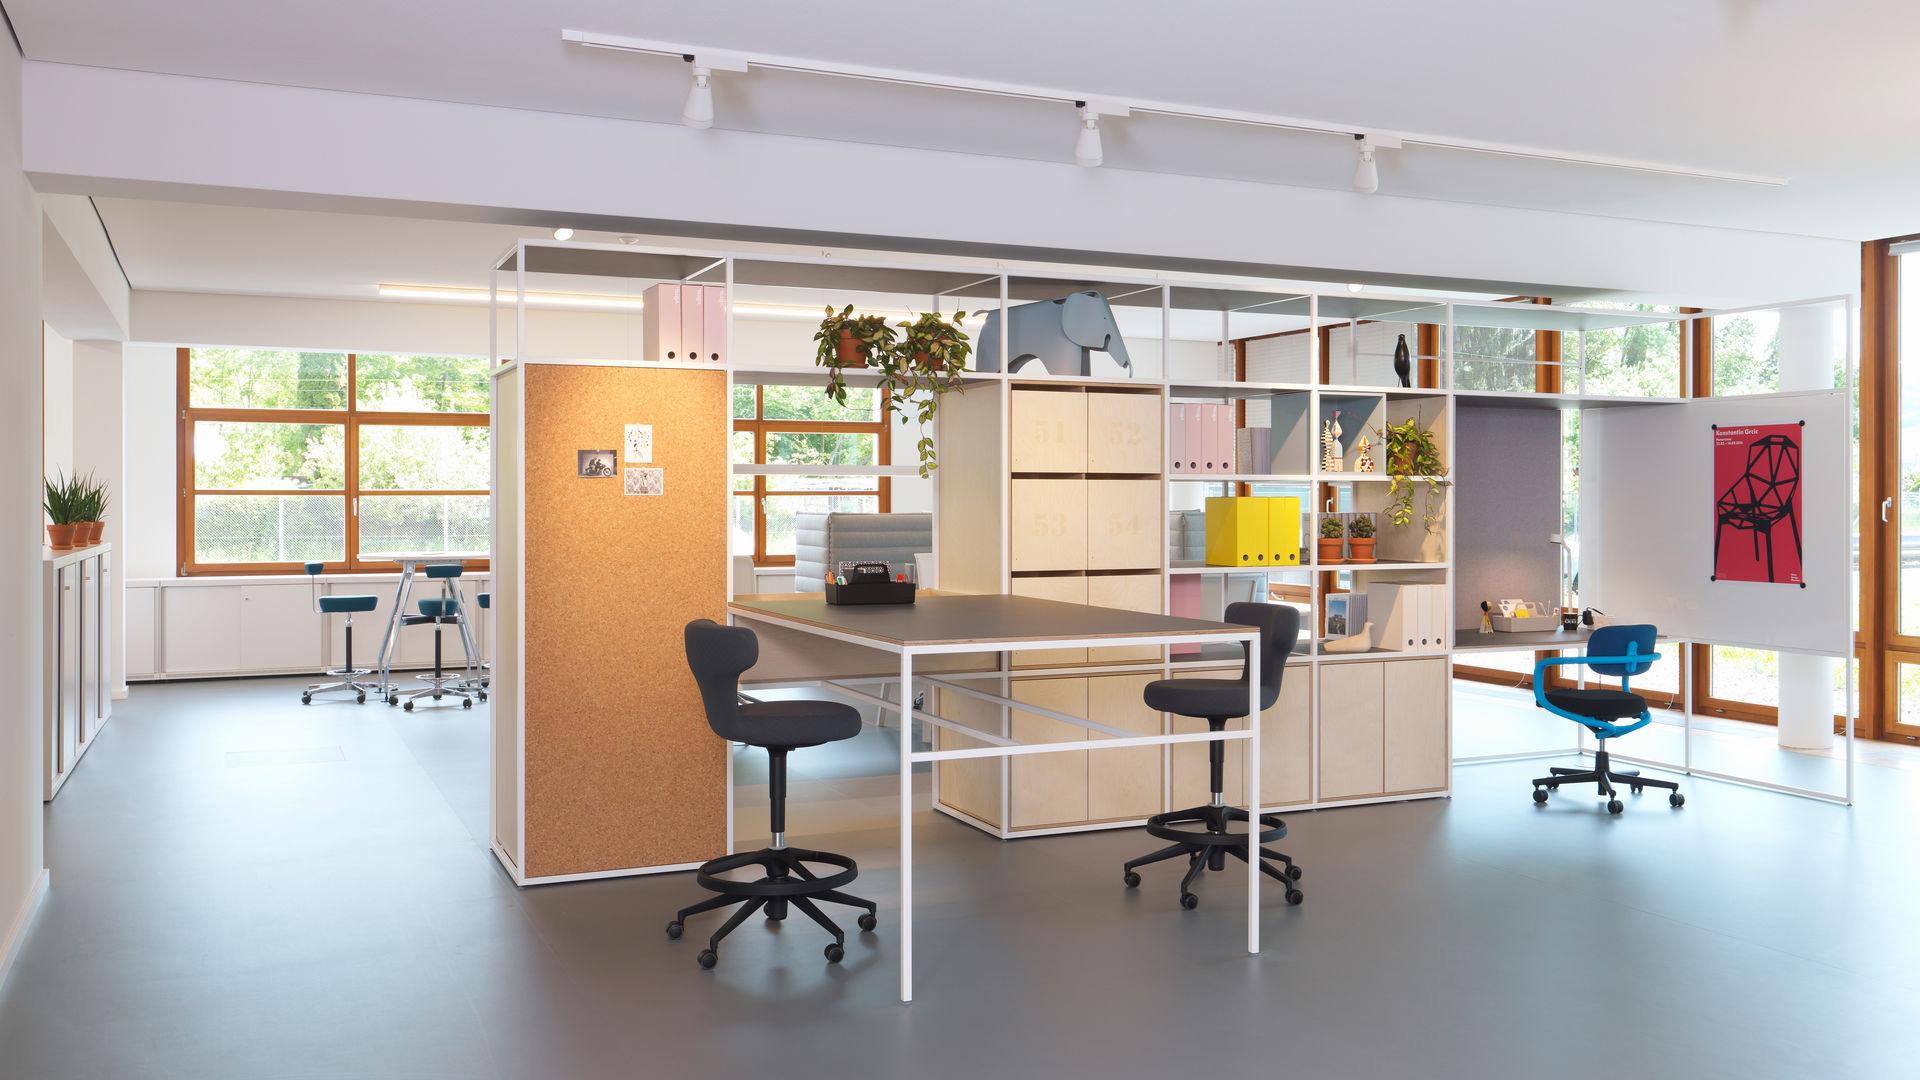 Studio Office, Vitra, Birsfelden (Switzerland) (2)version_web_reference